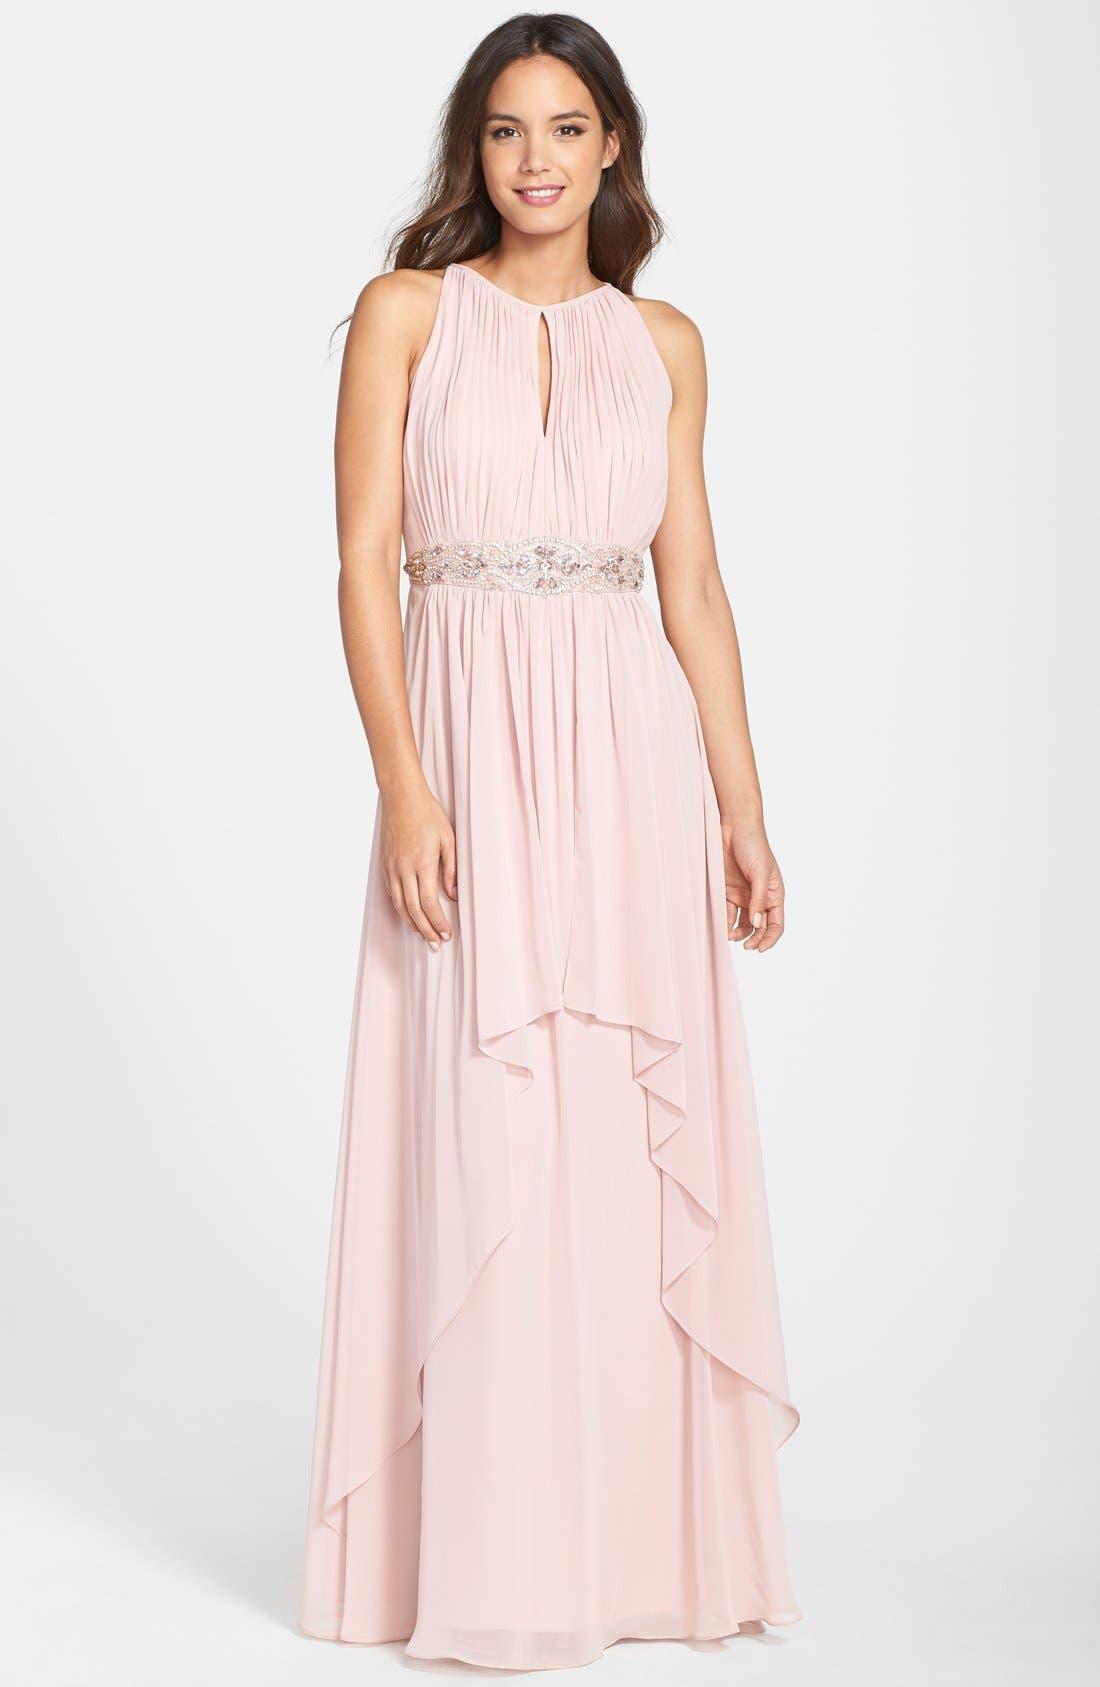 Alternate Image 1 Selected - Eliza J Embellished Chiffon Gown (Petite)